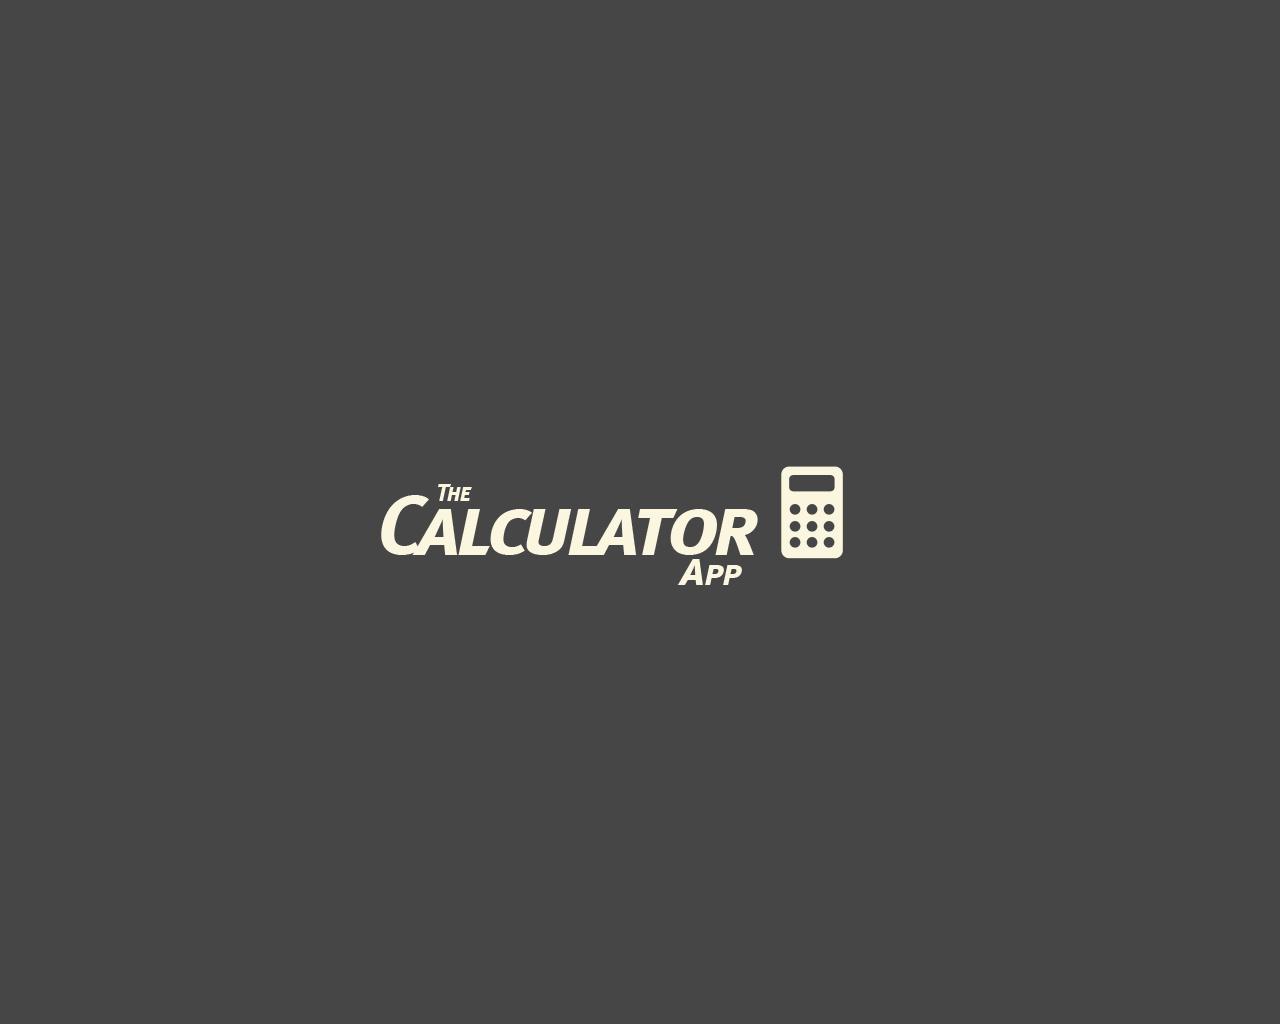 Development of a Calculator App for Windows 8 - Calcu TEC